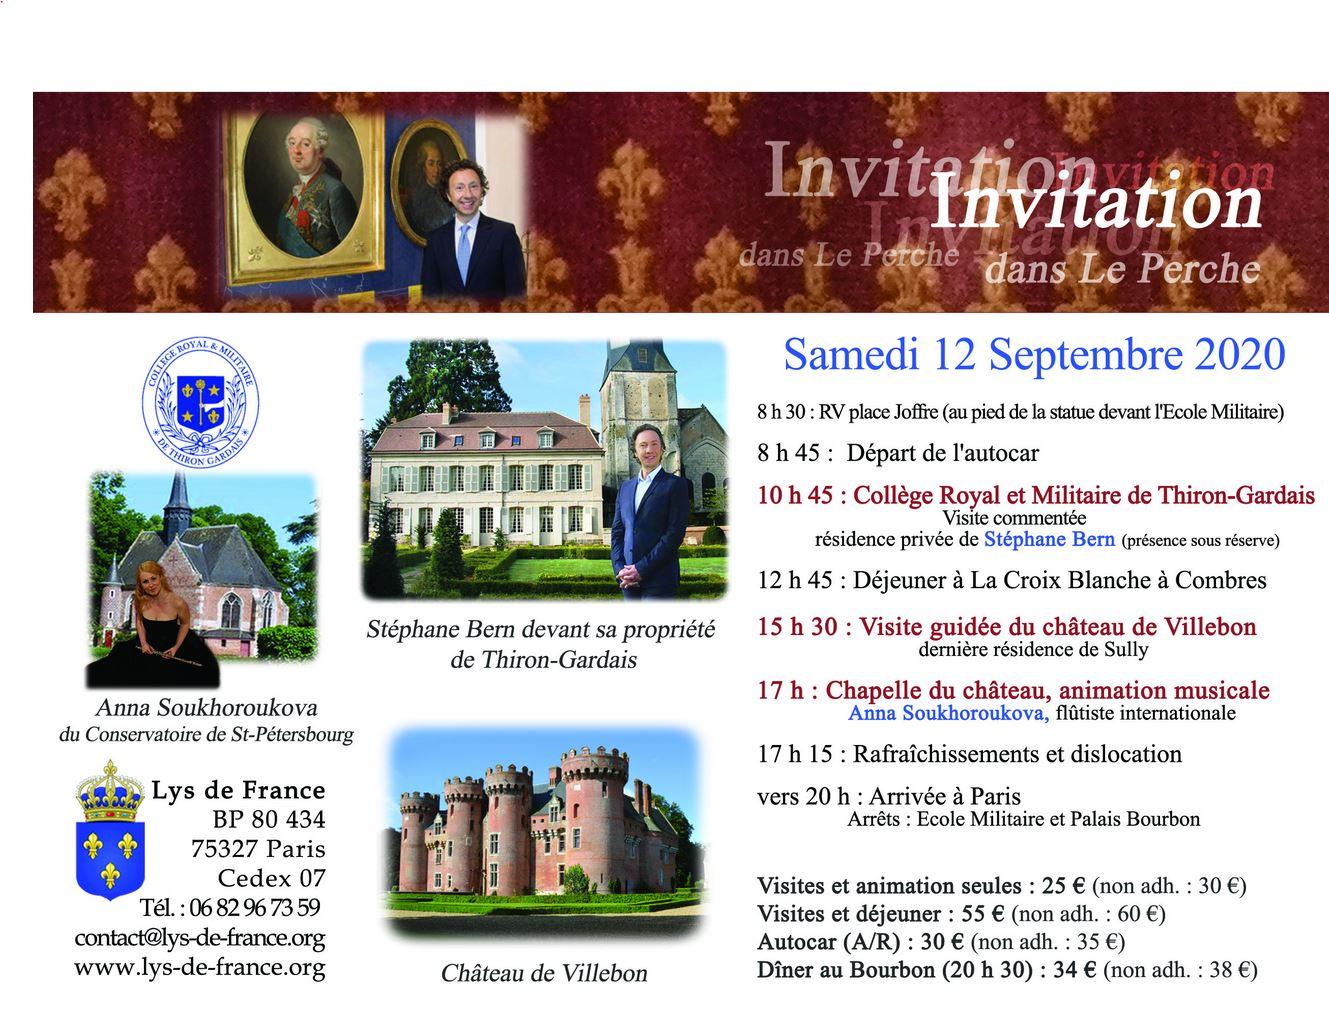 Invitation du 12 Septembre